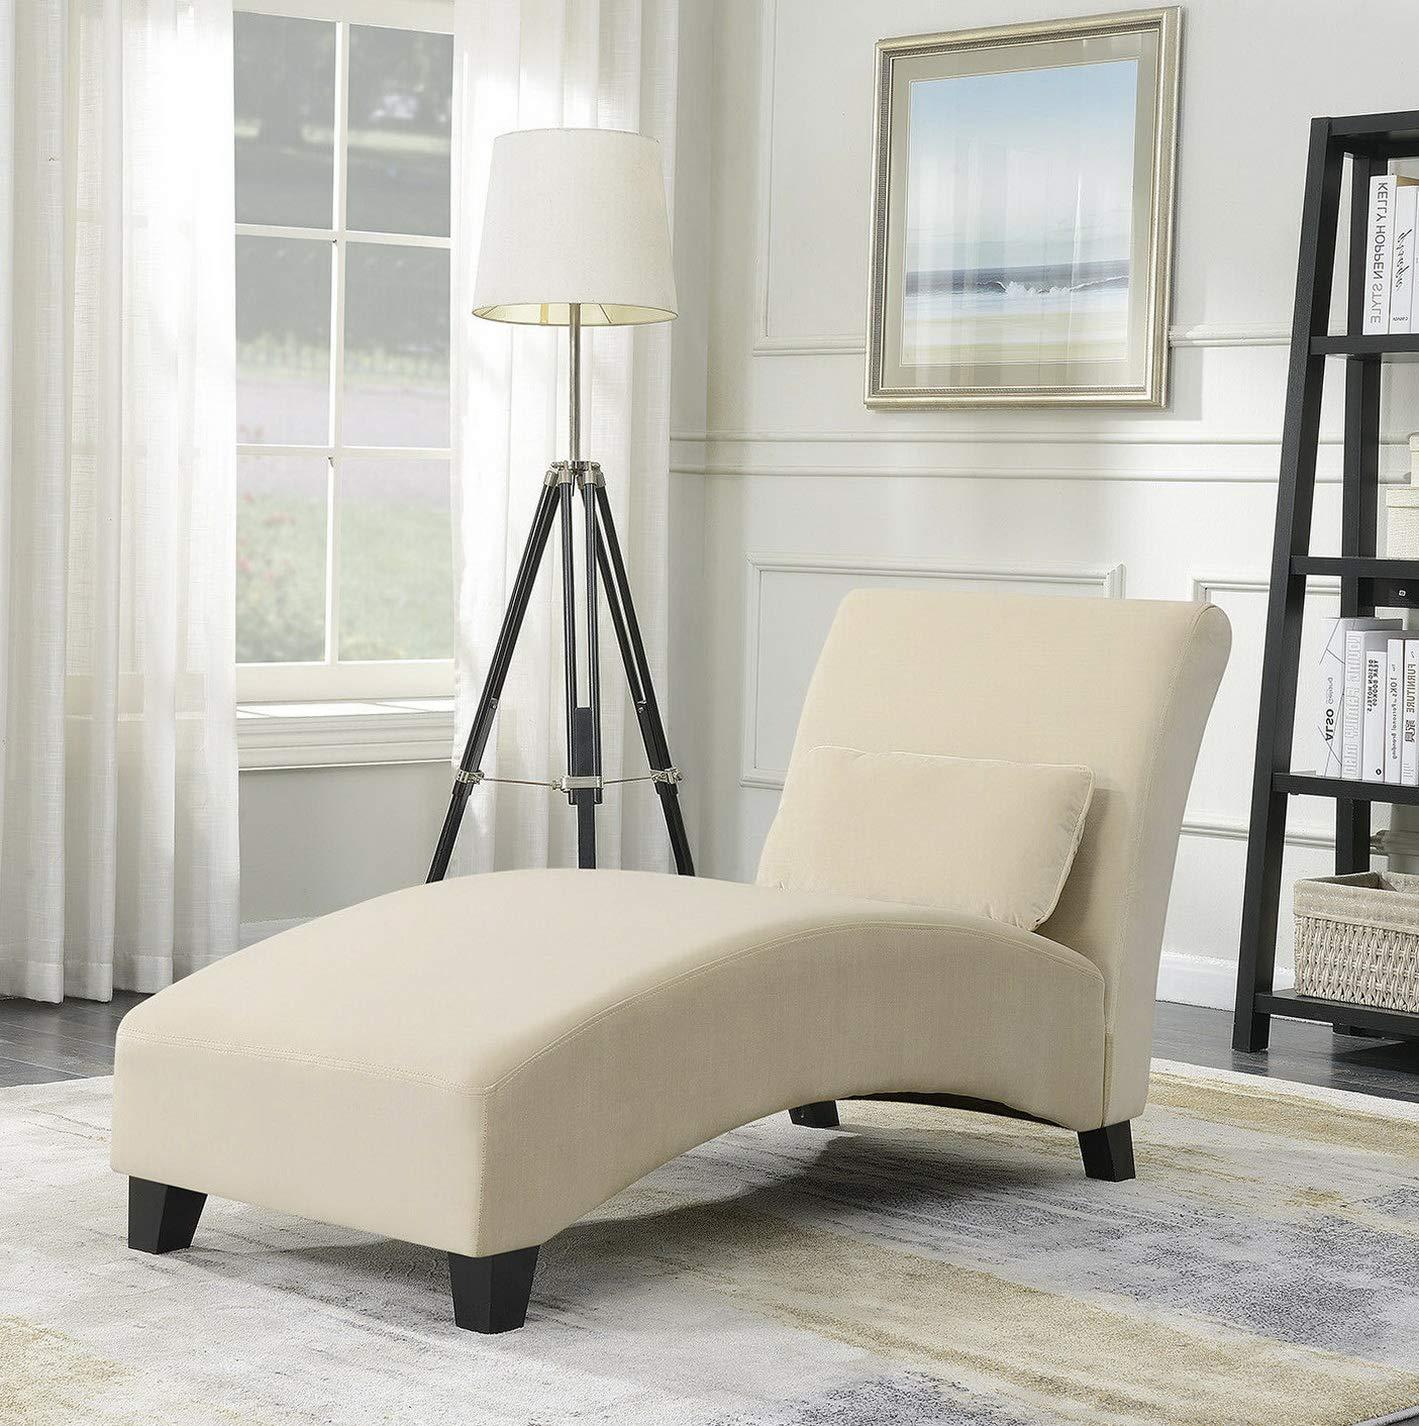 Amazon.com: Hebel Chaise Lounge Living Room Chair Modern ...